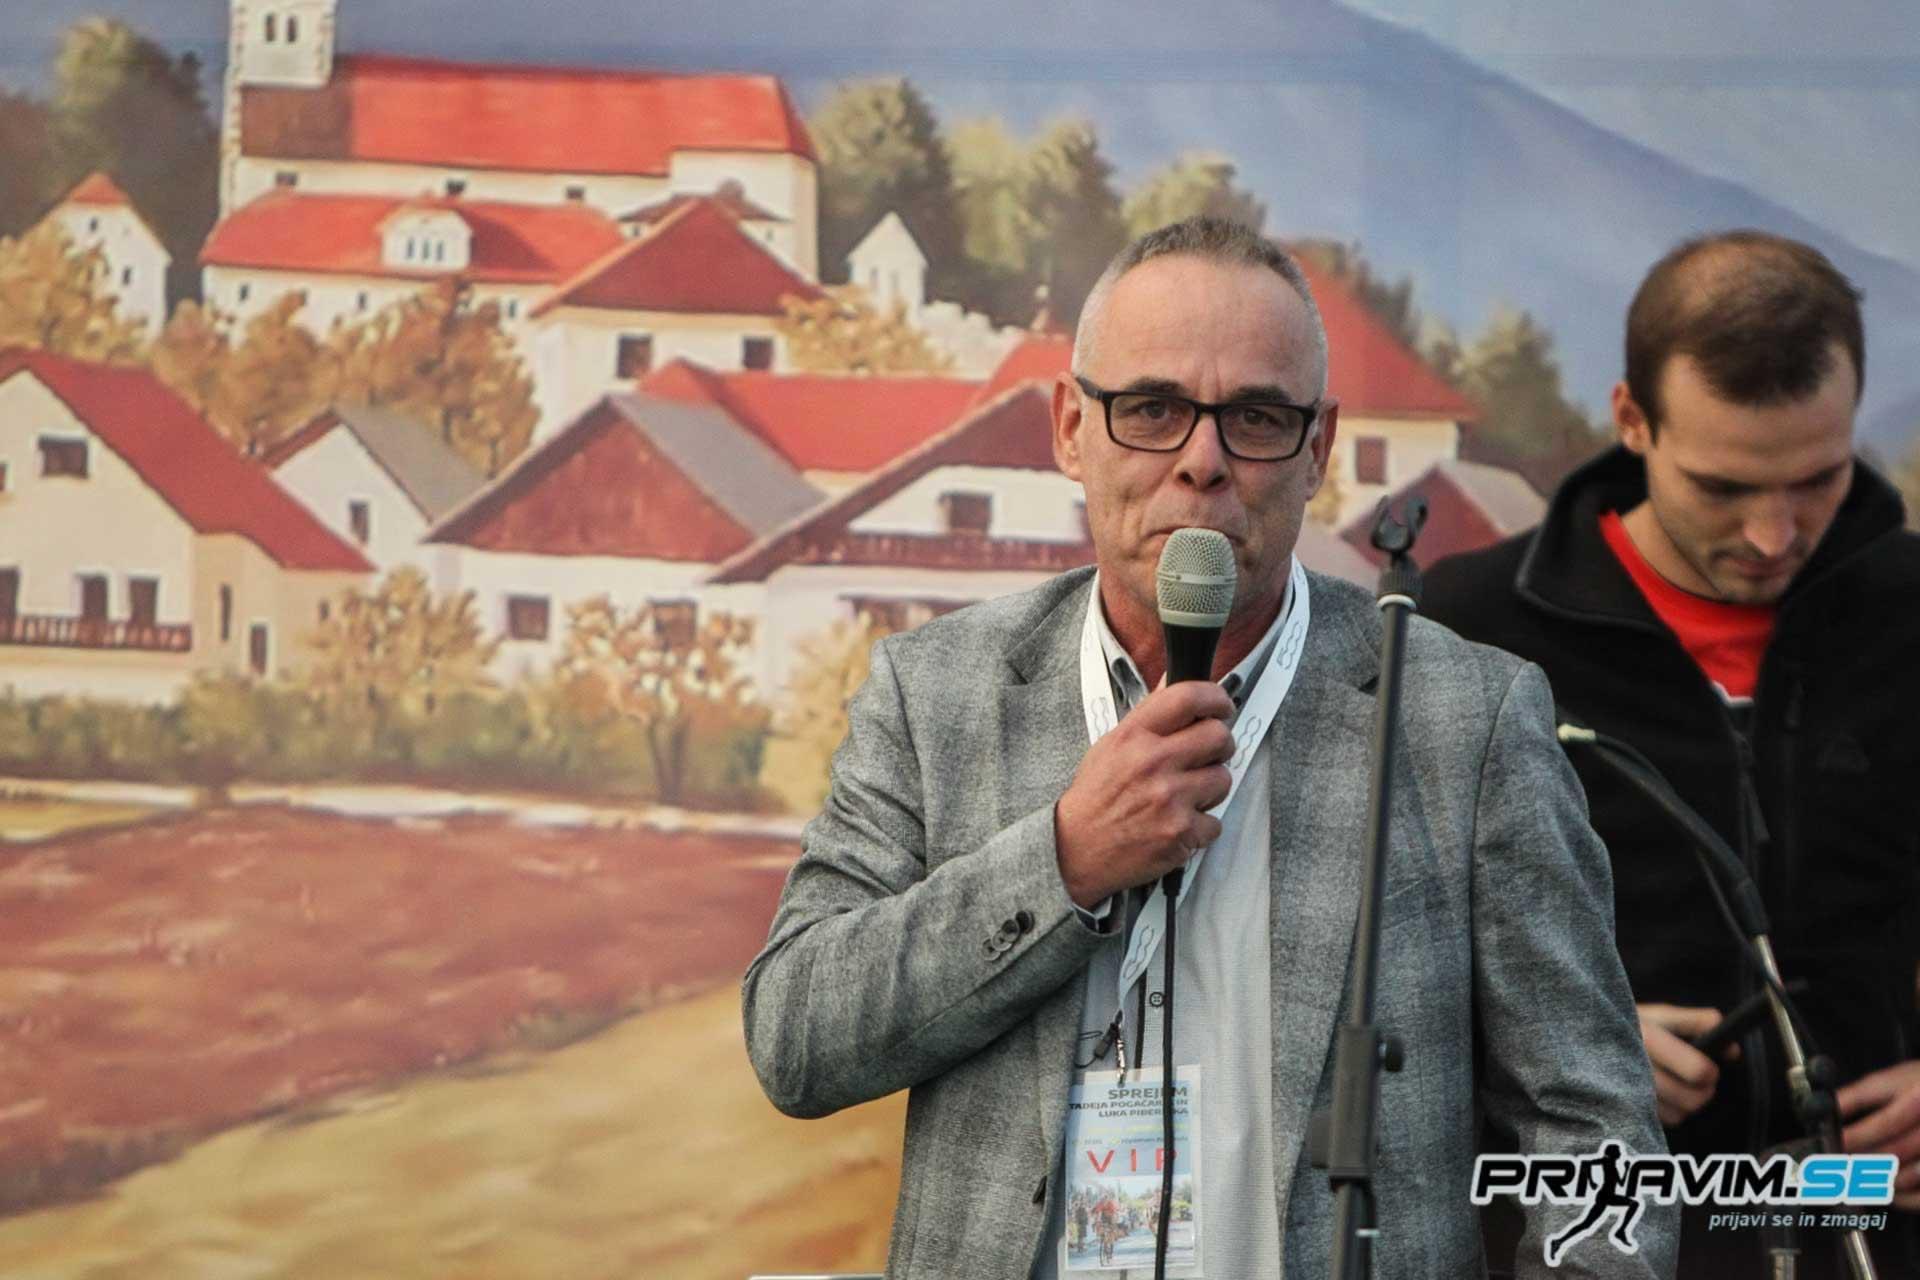 Župan Stanislav Poglajen